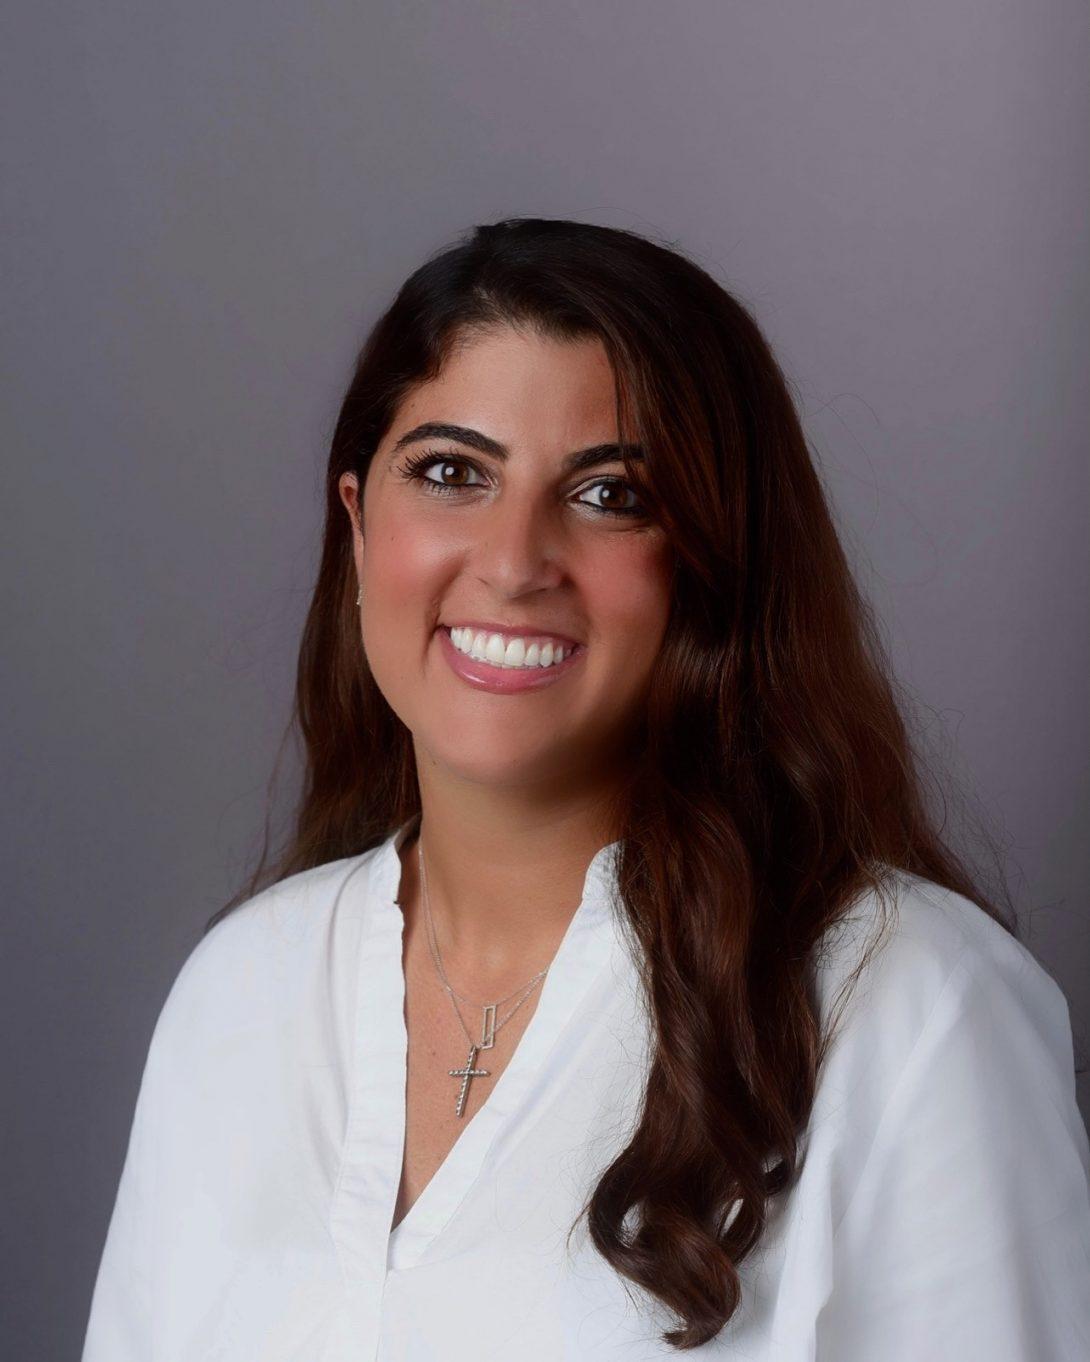 portrait of Dr. Emelia Karkazis